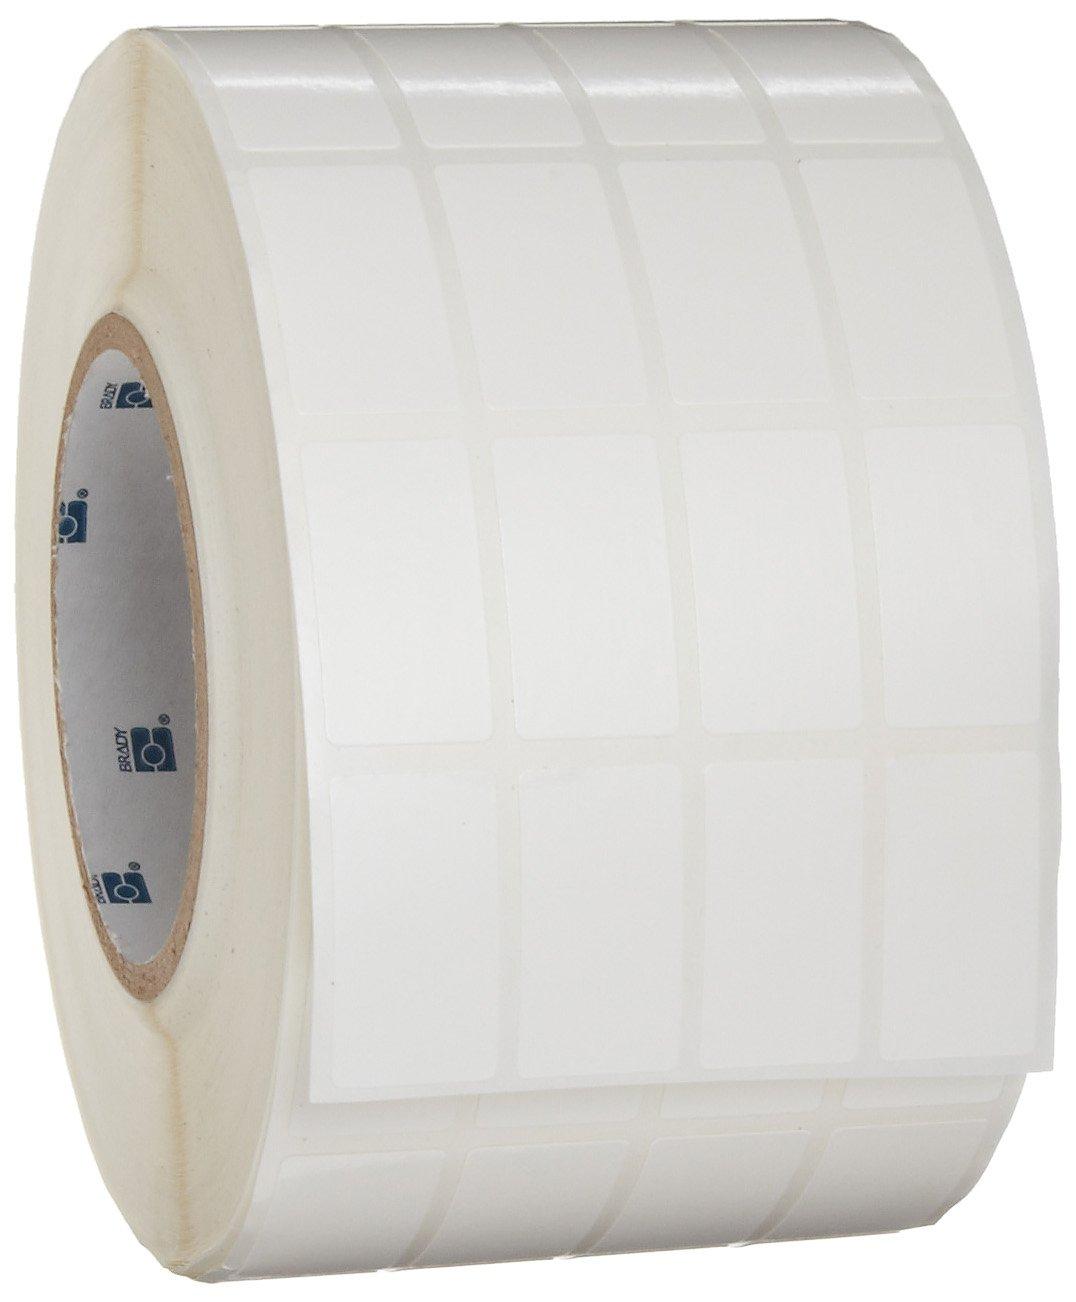 Brady THT-165-498-5 0.8'' Width x 1.437'' Height, 3.7'' Web Width, B-498 Vinyl Cloth, Semi-Gloss Finish White Thermal Transfer Printer Label (5000 per Roll)